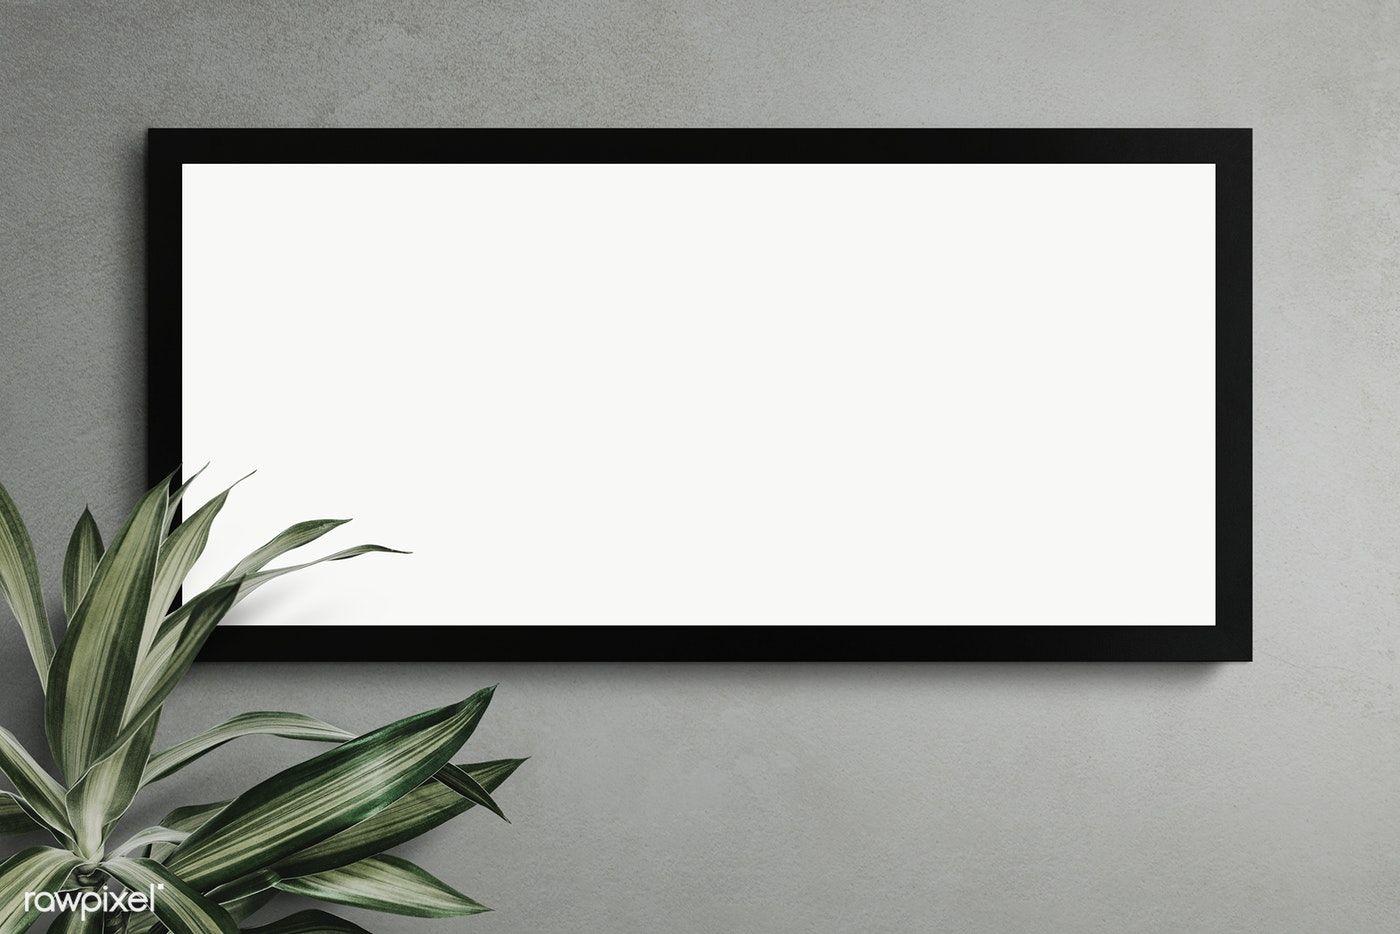 Black Frame Mockup On A Black Wall Transparent Png Premium Image By Rawpixel Com Awirwreckkwrar Frame Mockups Frames On Wall Red Picture Frames